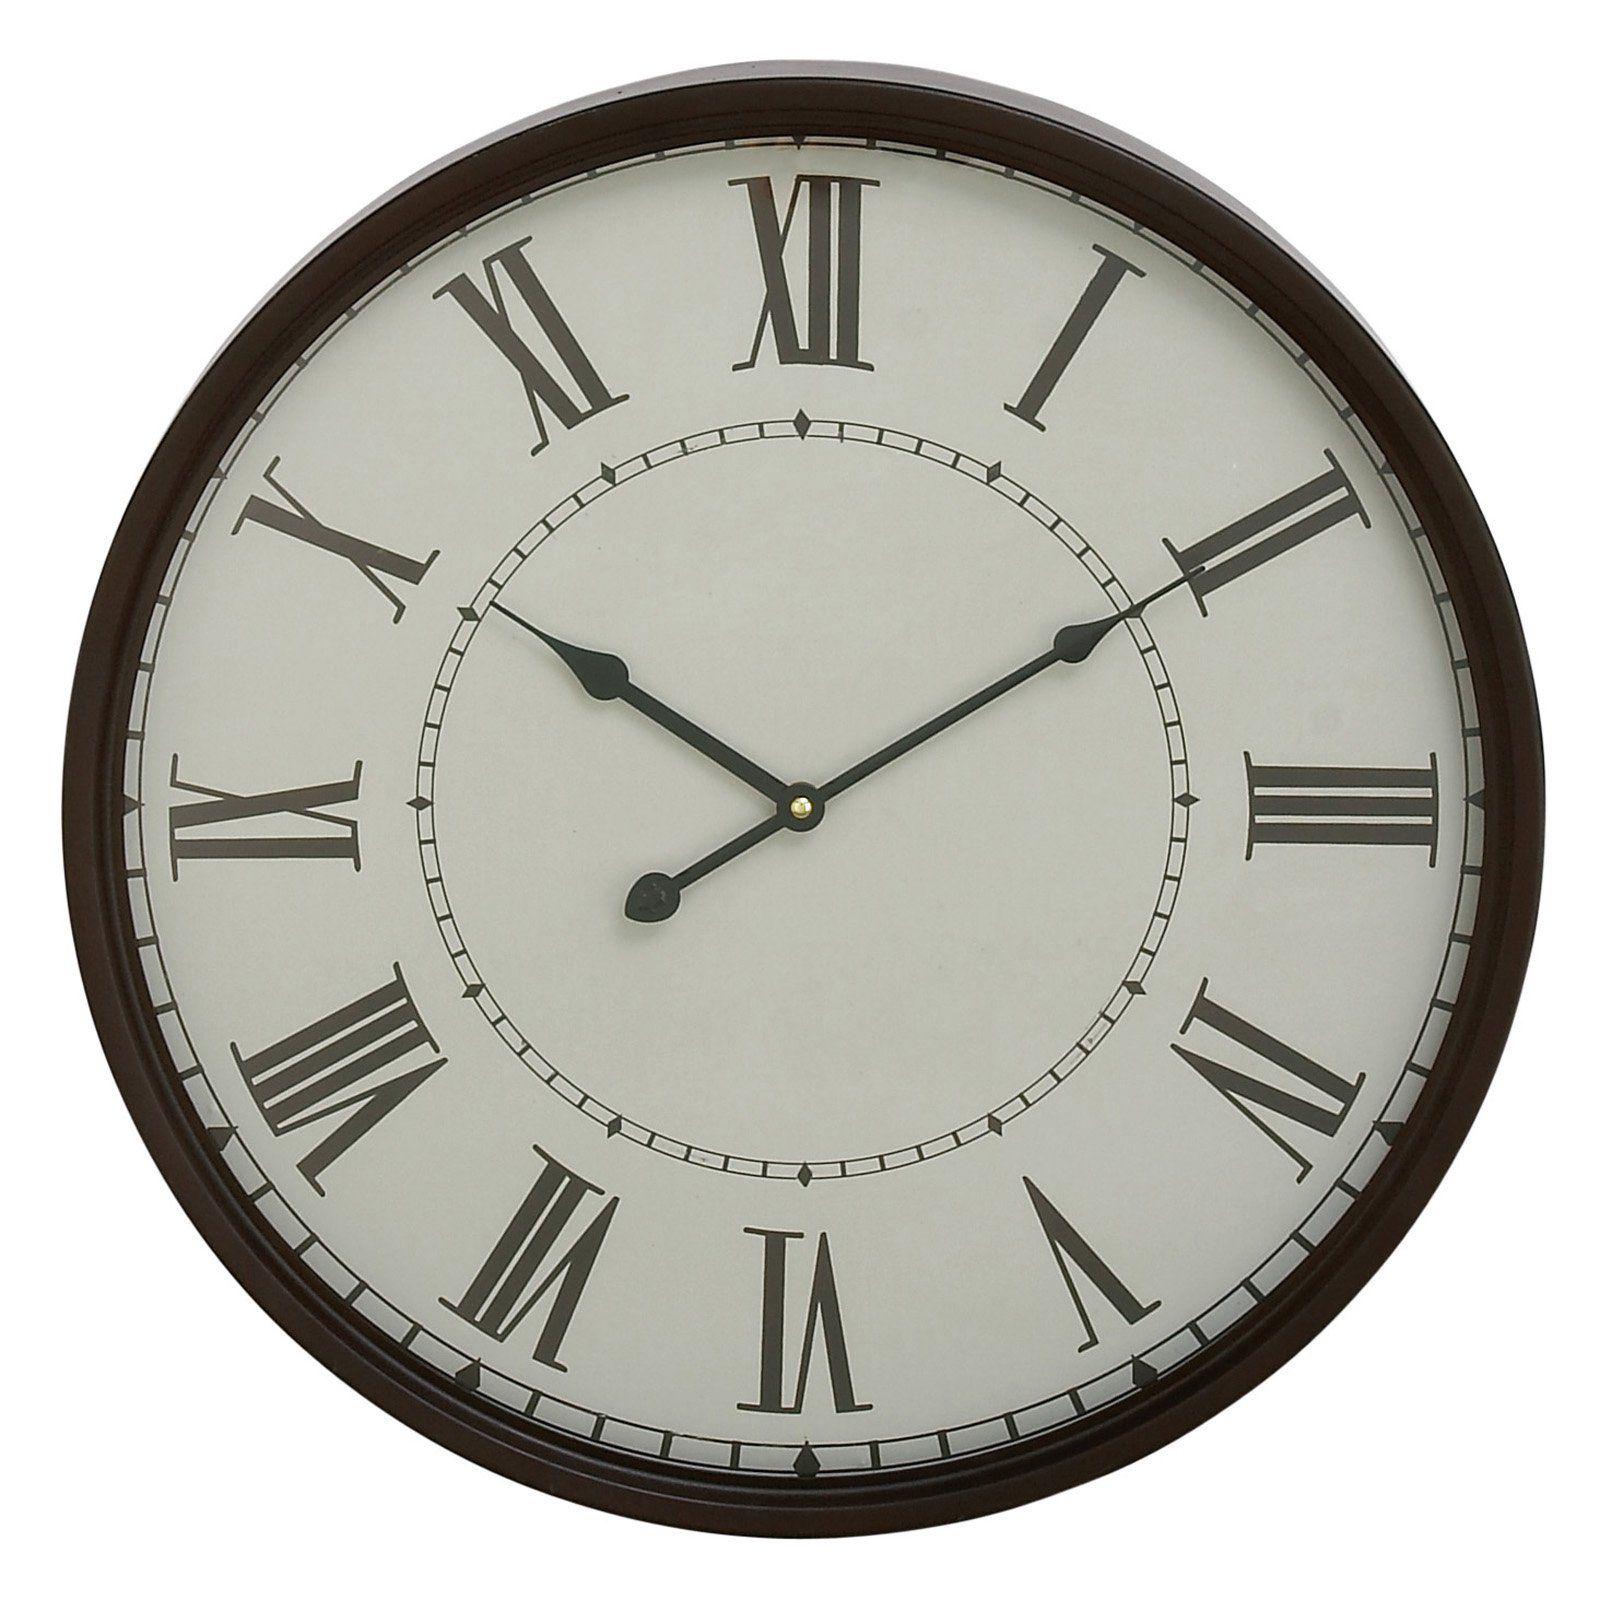 Decmode Metal Wall Clock 20 Diam In Metal Wall Clock Wall Clock Clock